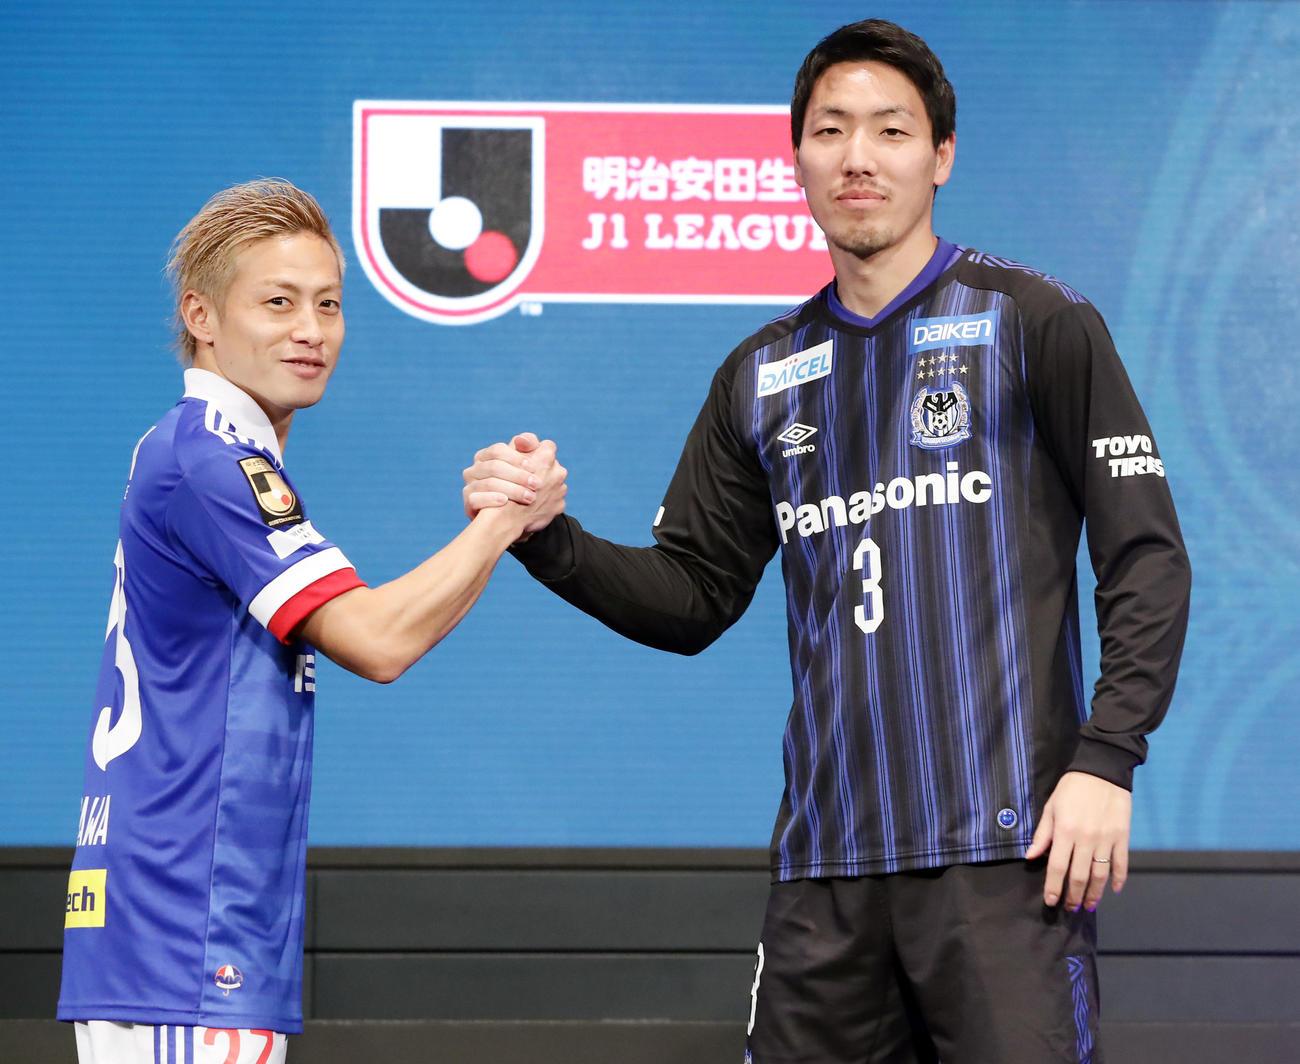 2020Jリーグキックオフカンファレンスで開幕カードの横浜FW仲川(左)とG大阪DF昌子は笑顔で握手(撮影・浅見桂子)